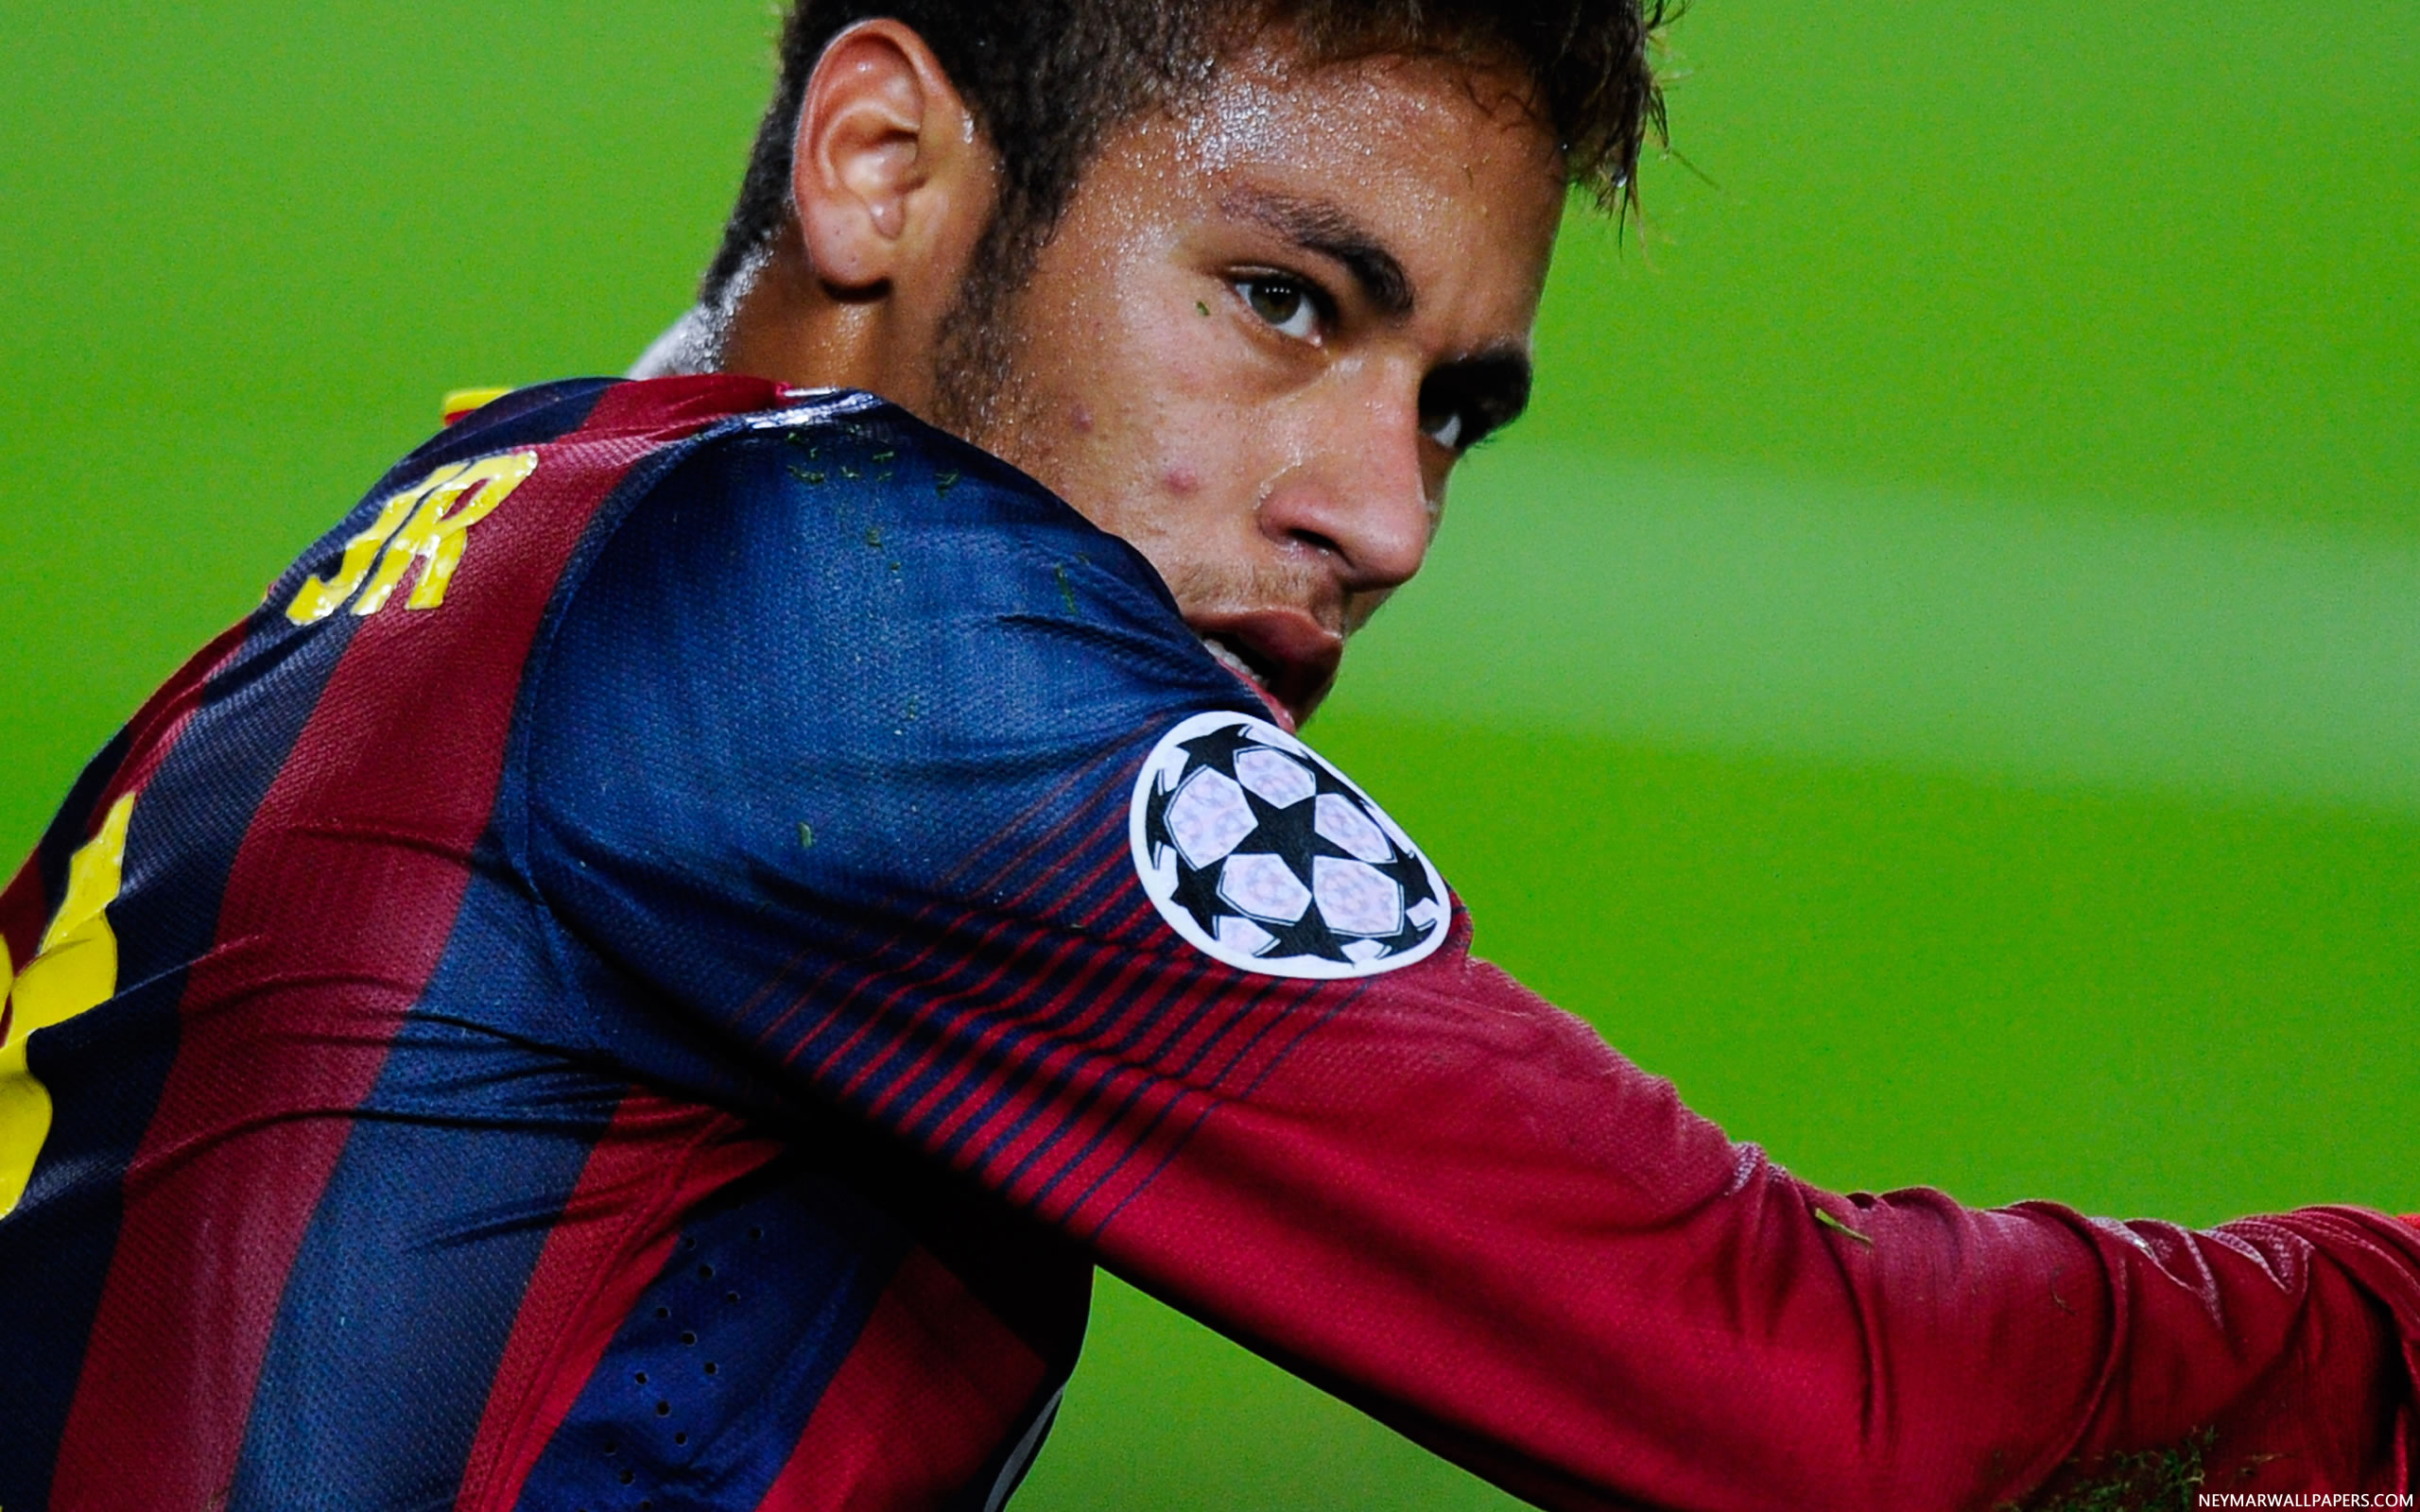 Neymar on grass Barcelona wallpaper